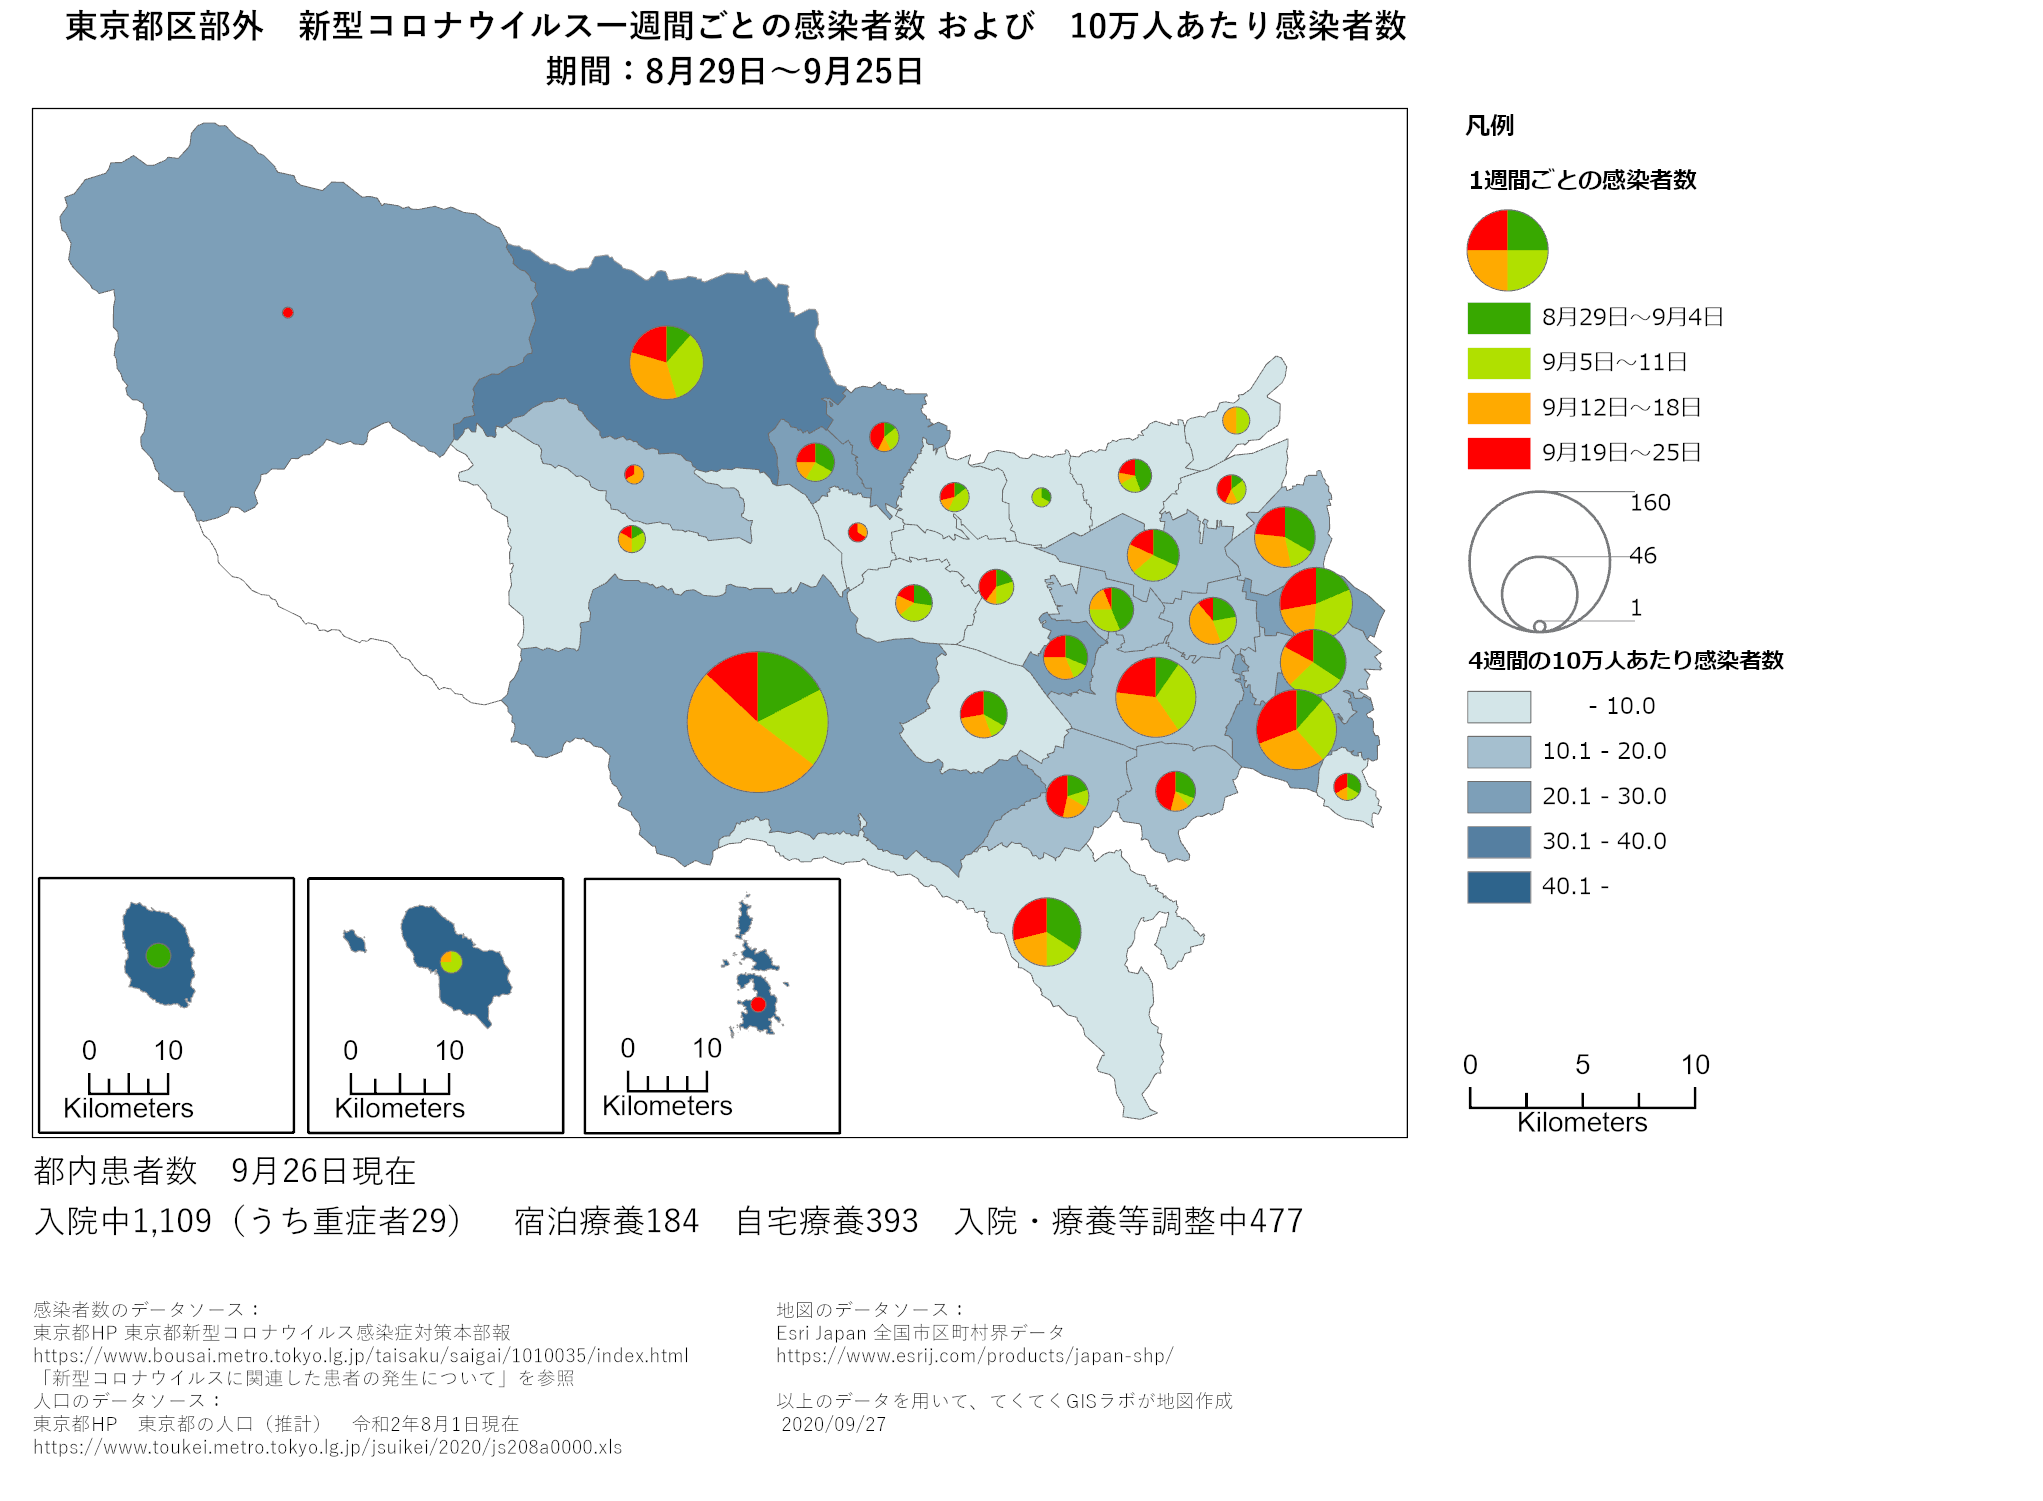 1週間ごと感染者数、東京都、8月29日〜9月25日